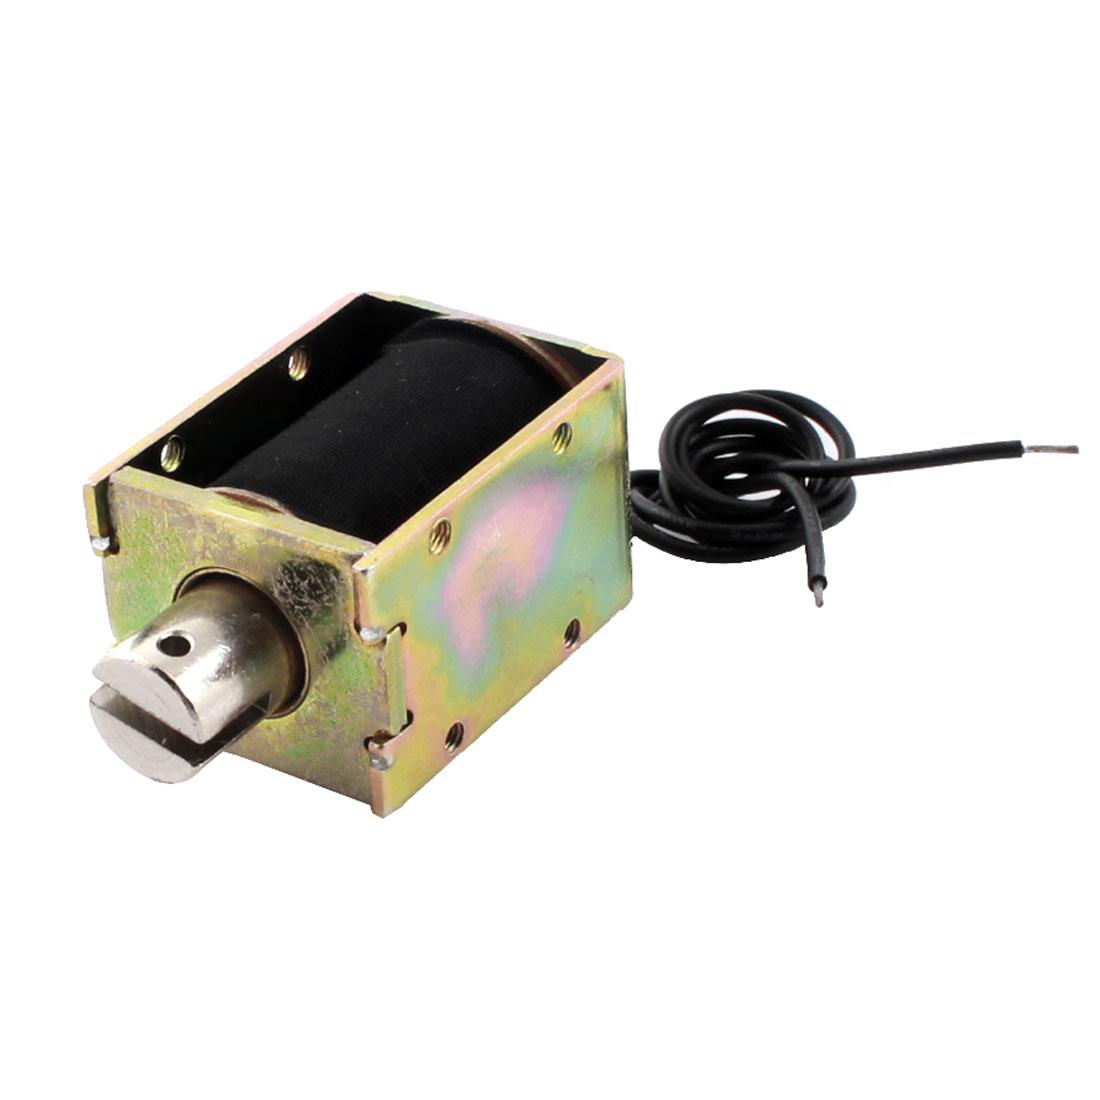 Spare Parts DC 6V 200g/5mm Pull Electric Magnet Solenoid Electromagnet